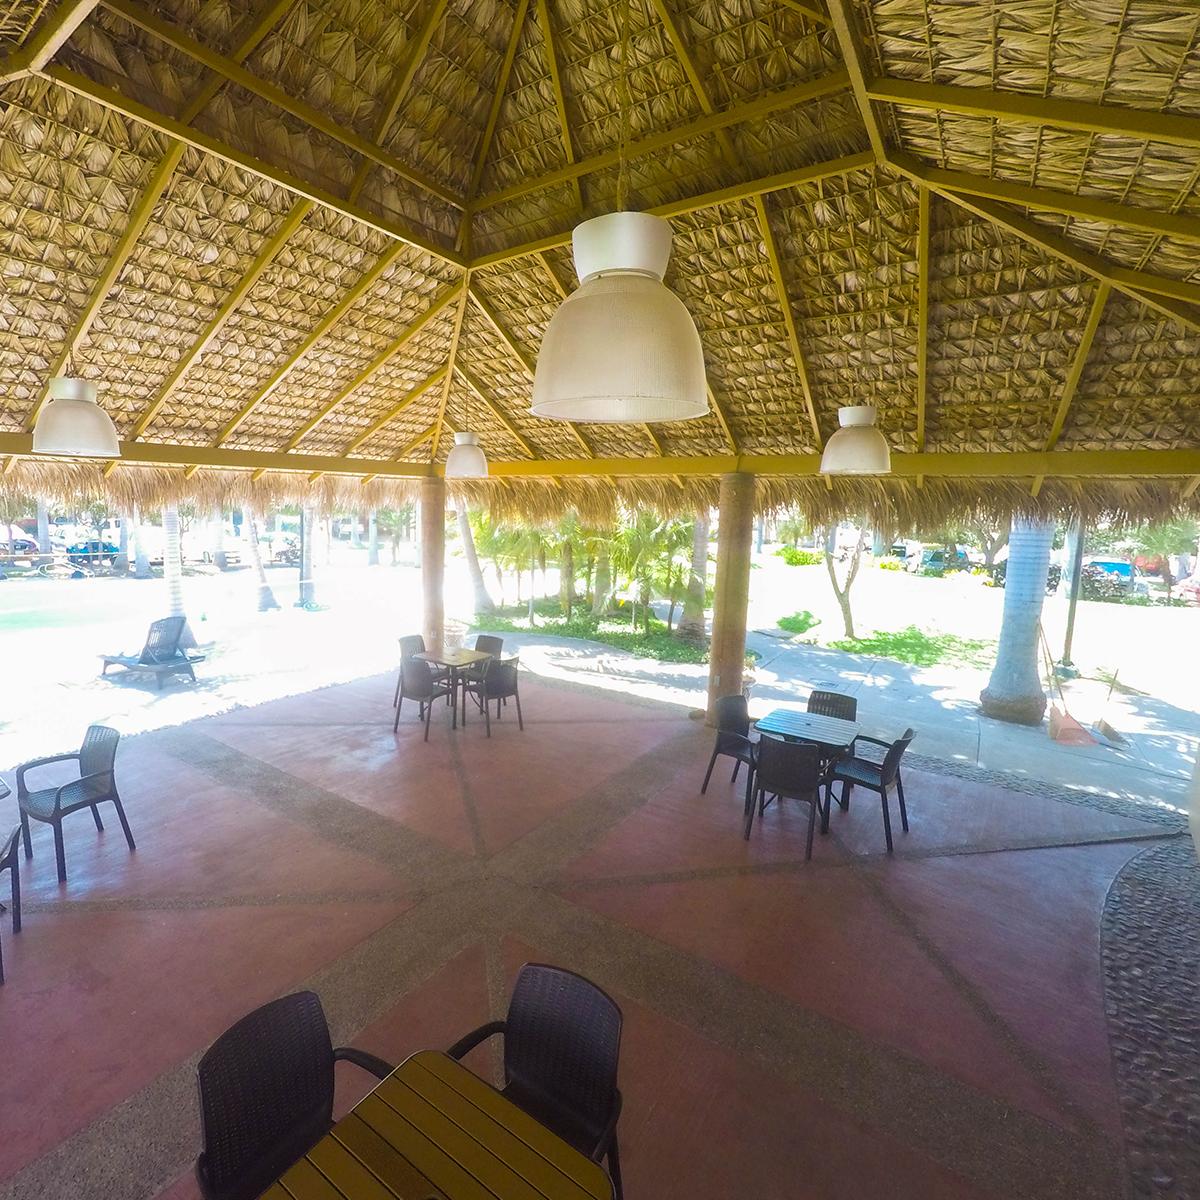 26 de 27: Casas club amplia para reuniones